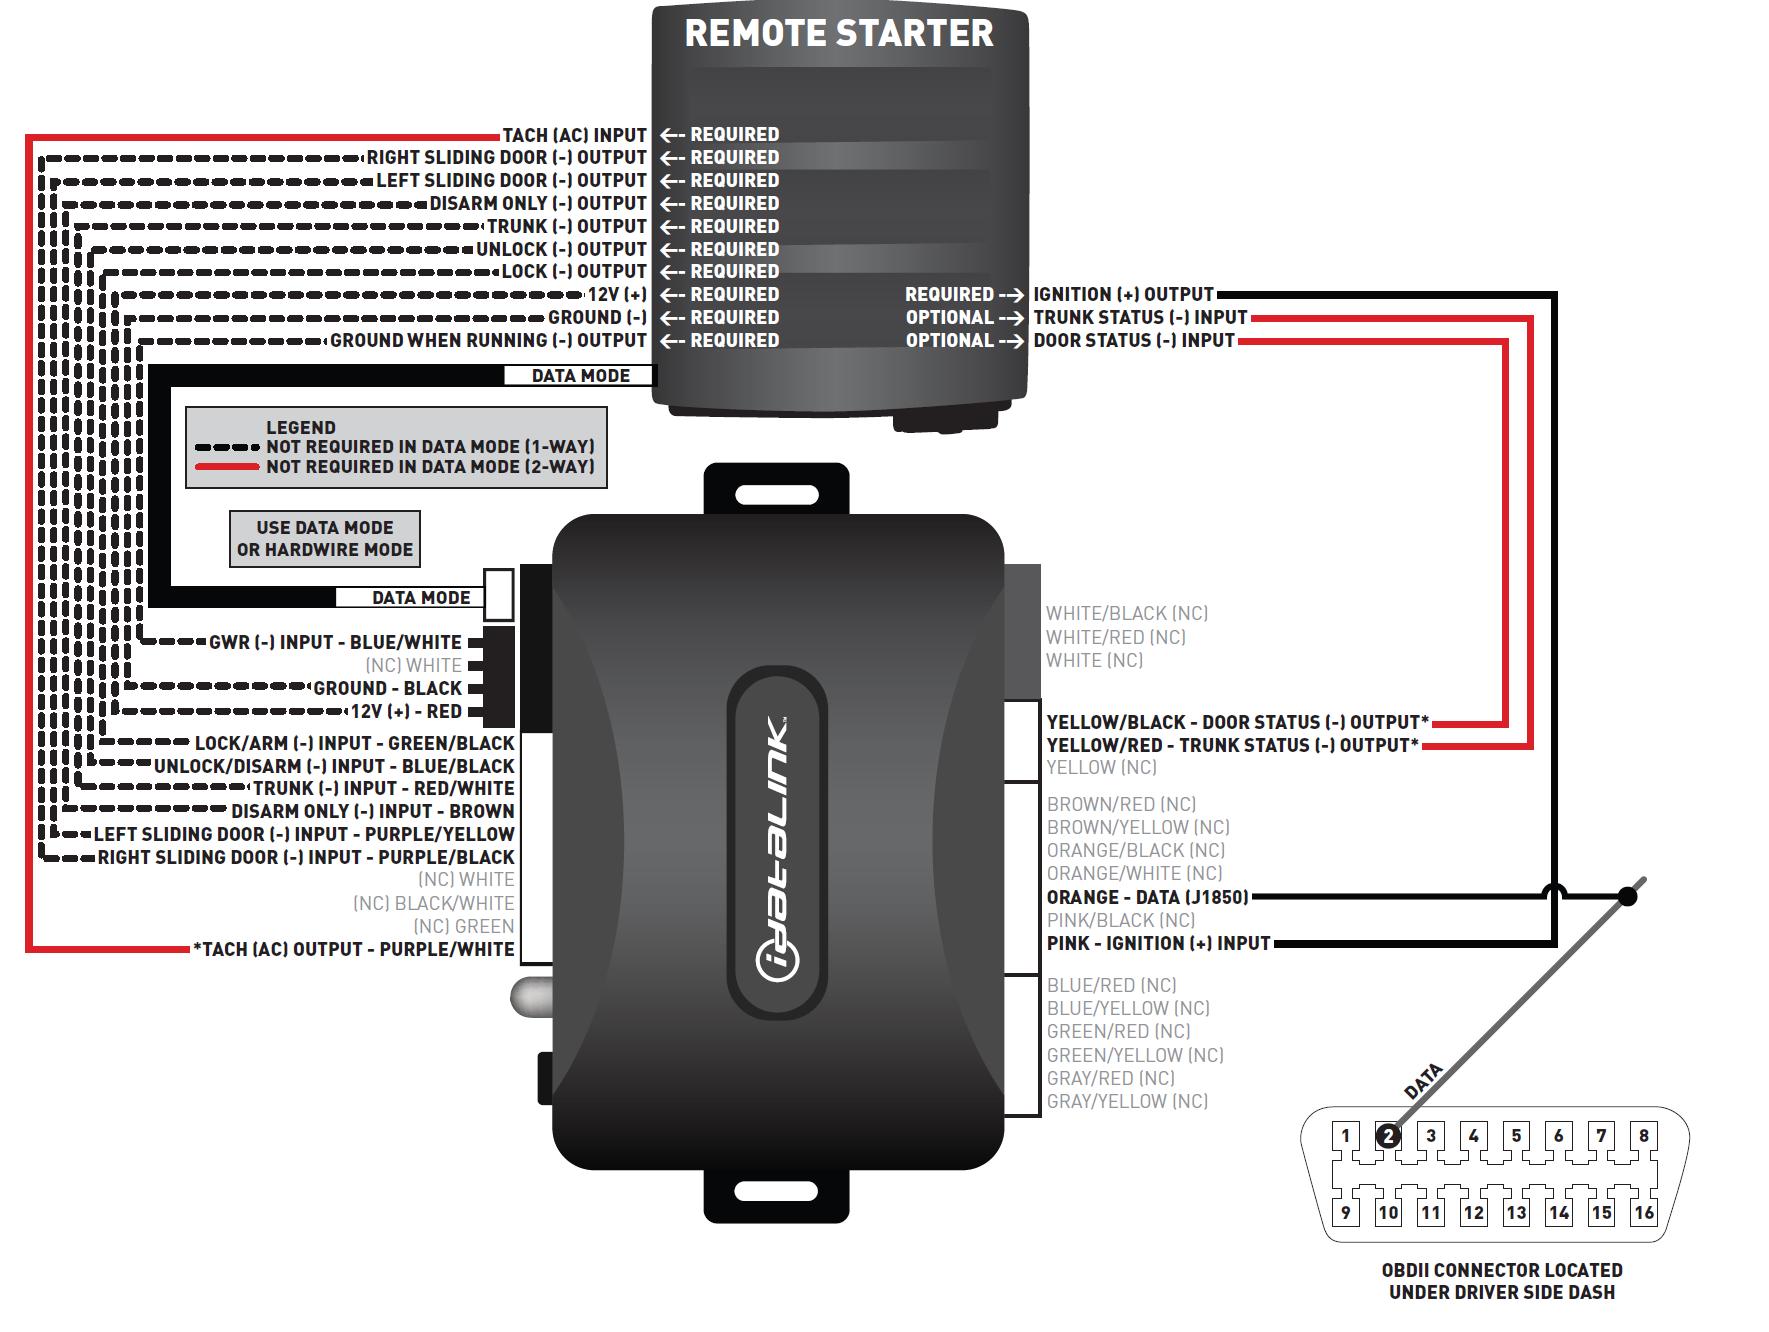 Car Alarm System Installation Guide - Car Sale and Rentals | Car Alarm Remote Start Installation Wiring Diagram Cd |  | Car Sale and Rentals